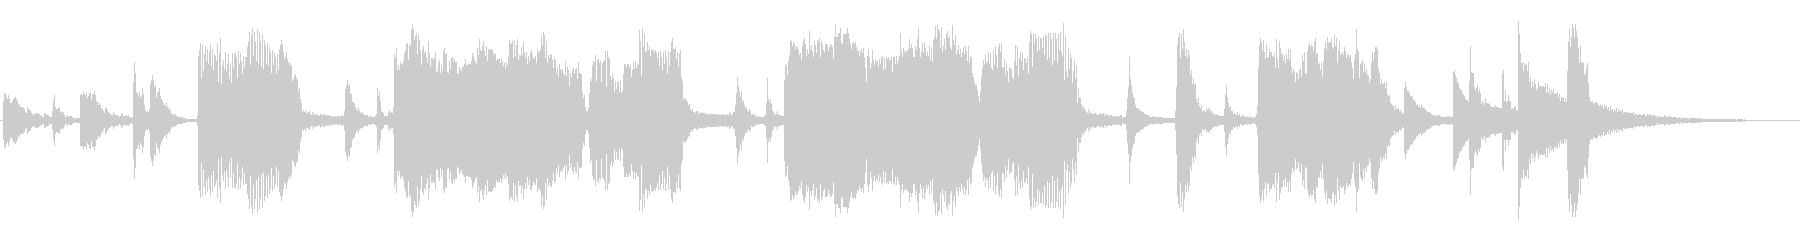 T.V.コンテンポラリー。卑劣ない...の未再生の波形